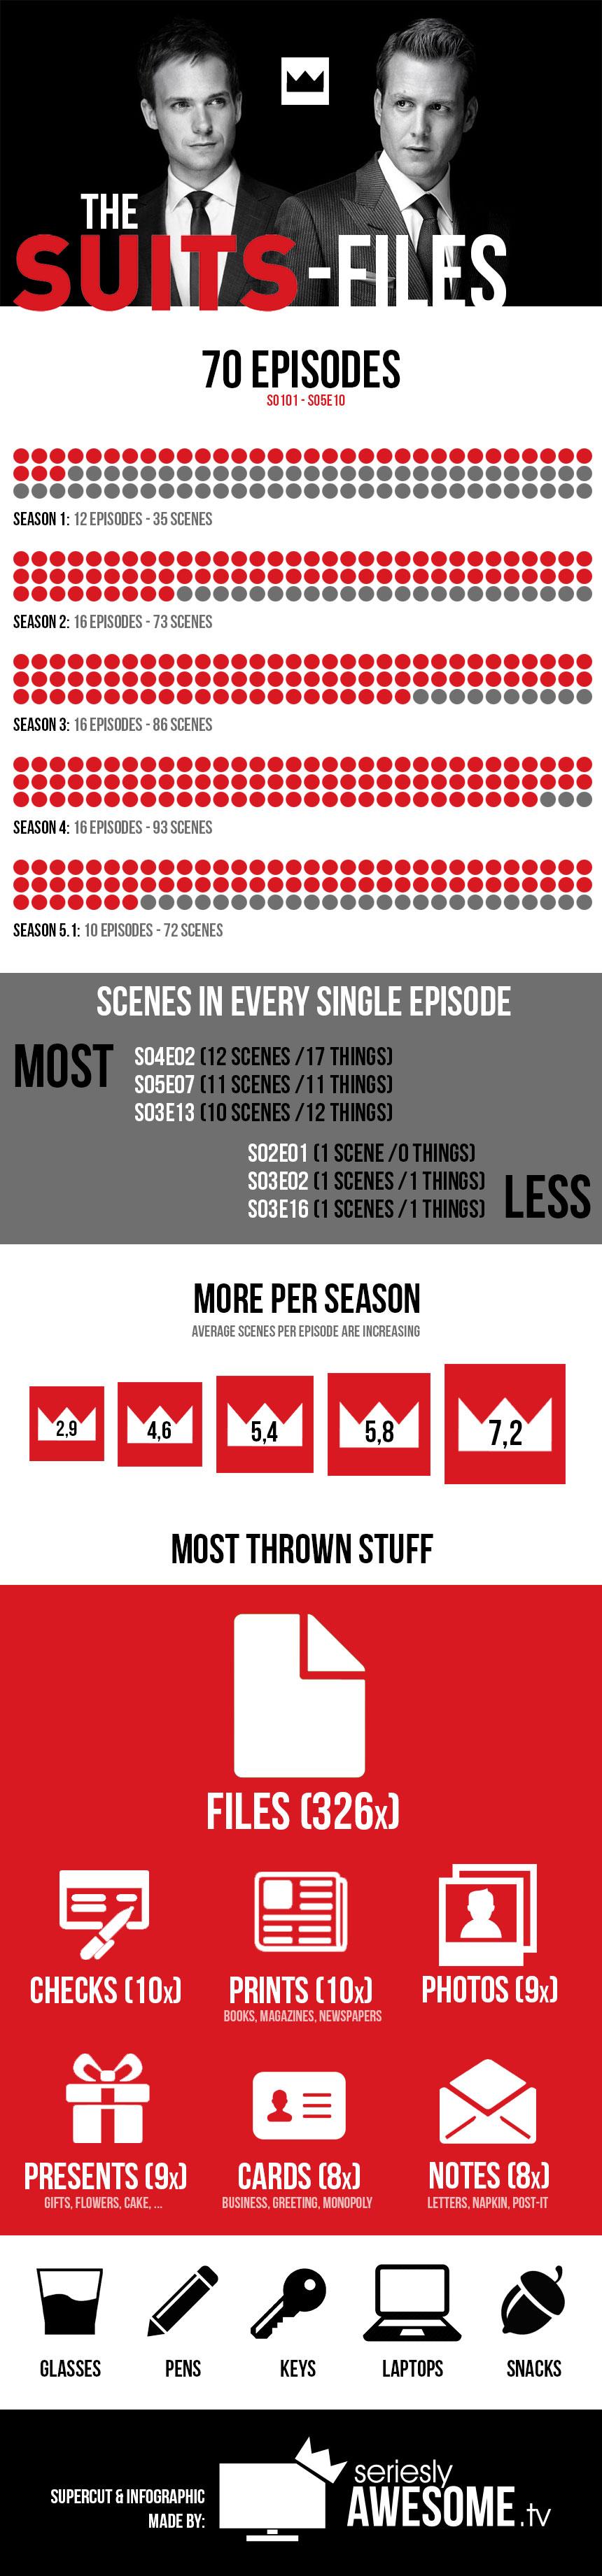 Suits-Files-Infografik